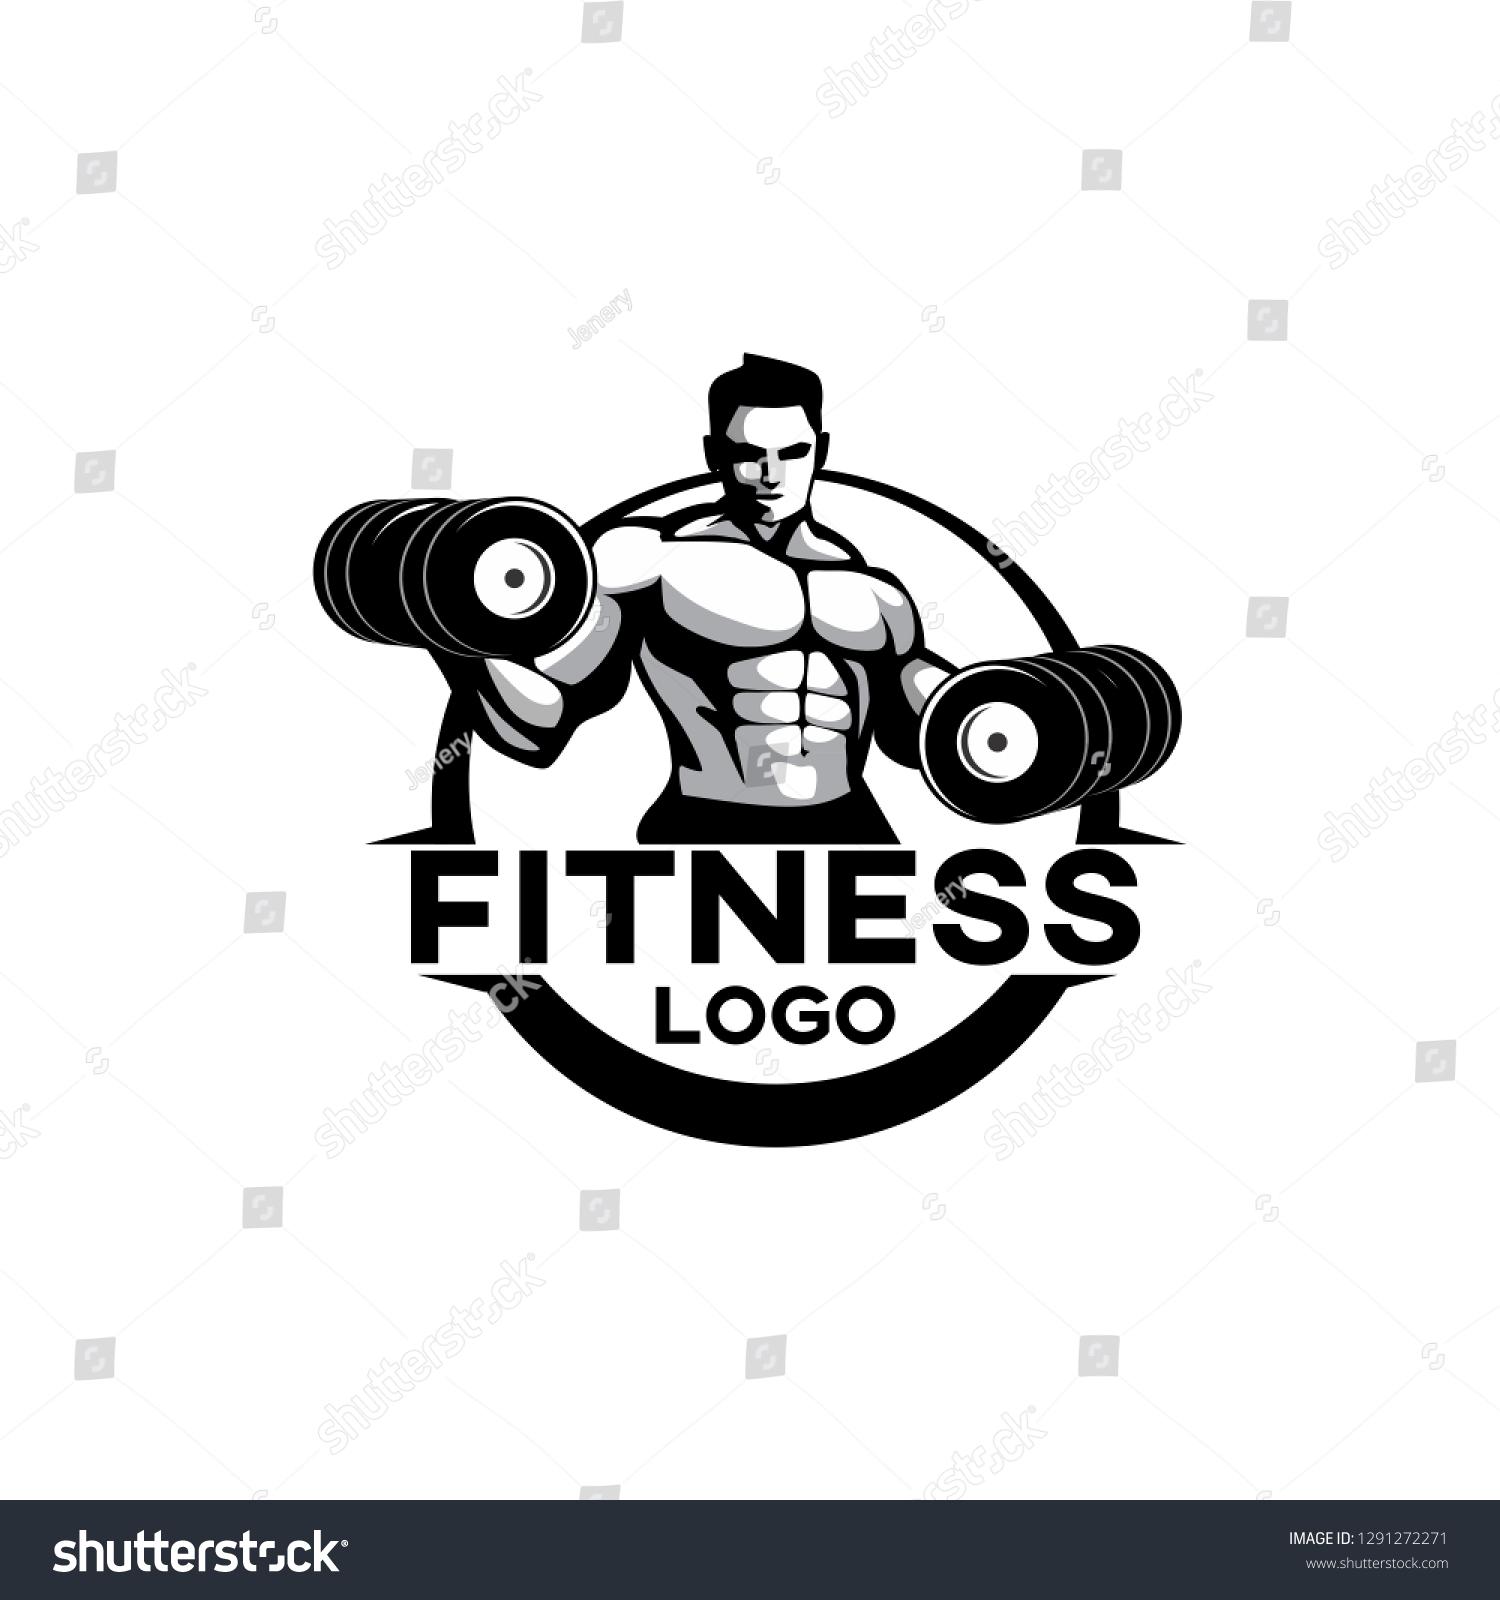 Fitness Logo Vector Design Template Design Stock Vector Royalty Free 1291272271